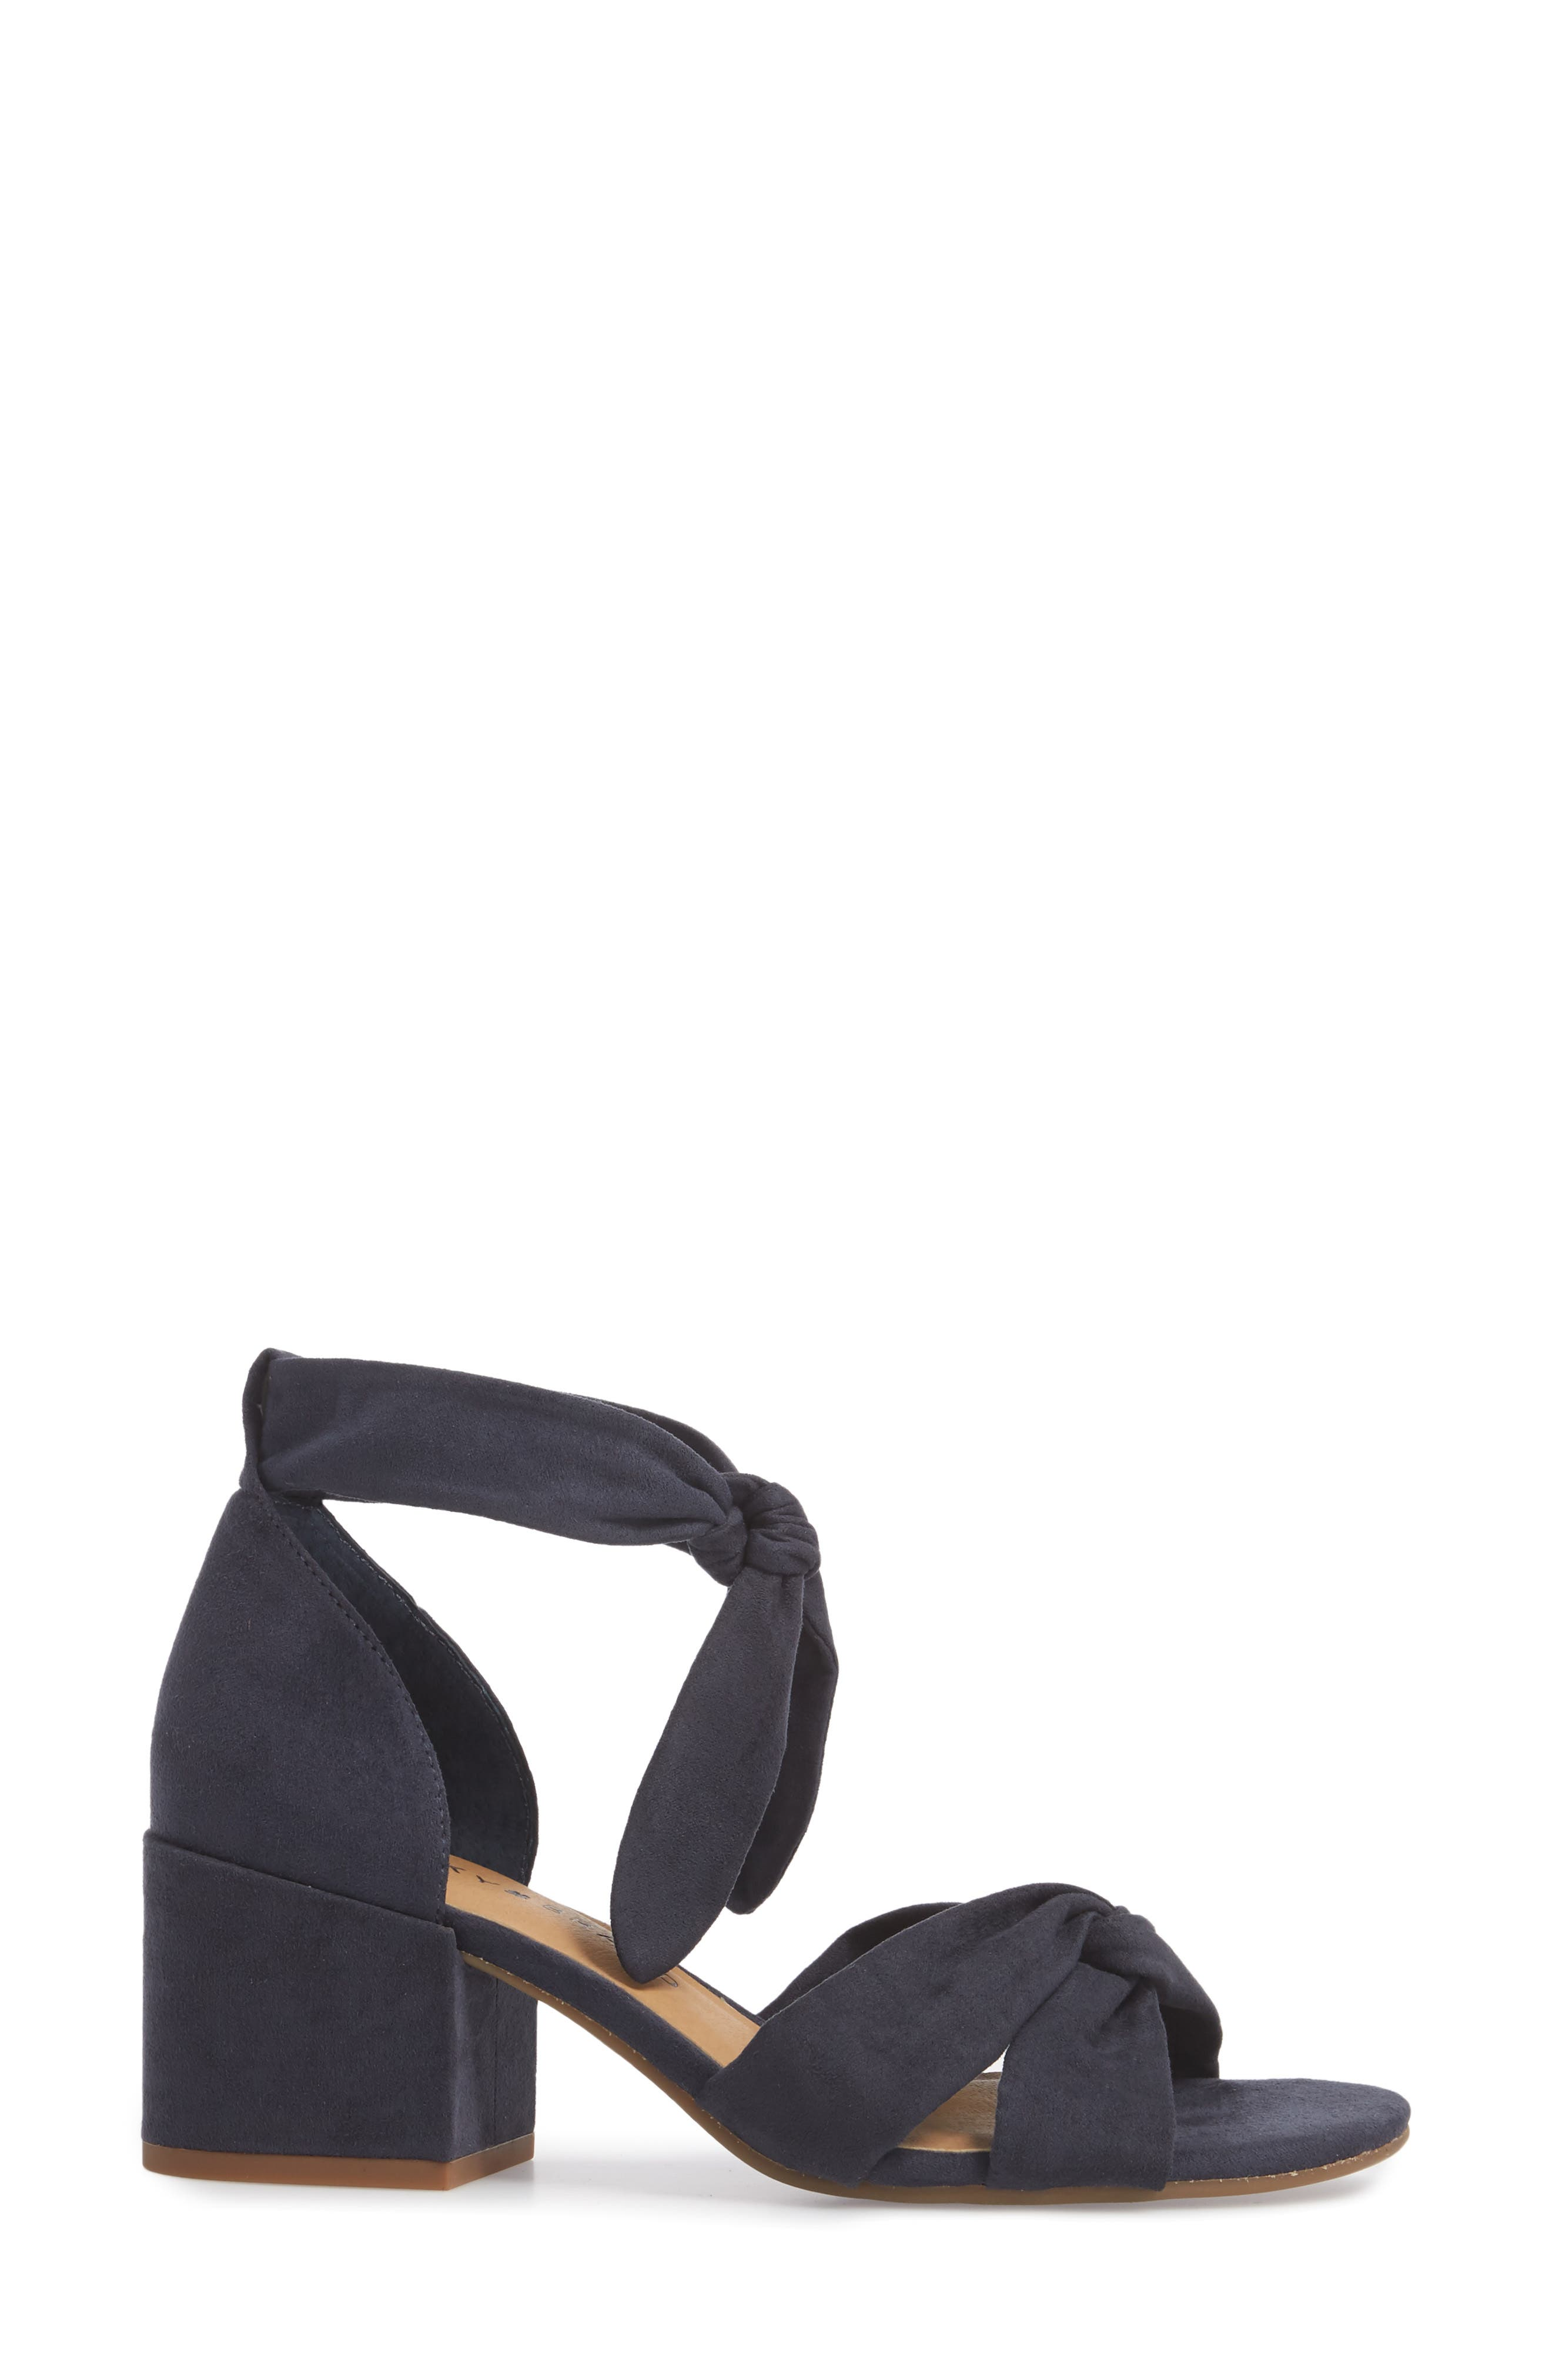 Xaylah Ankle Strap Sandal,                             Alternate thumbnail 20, color,